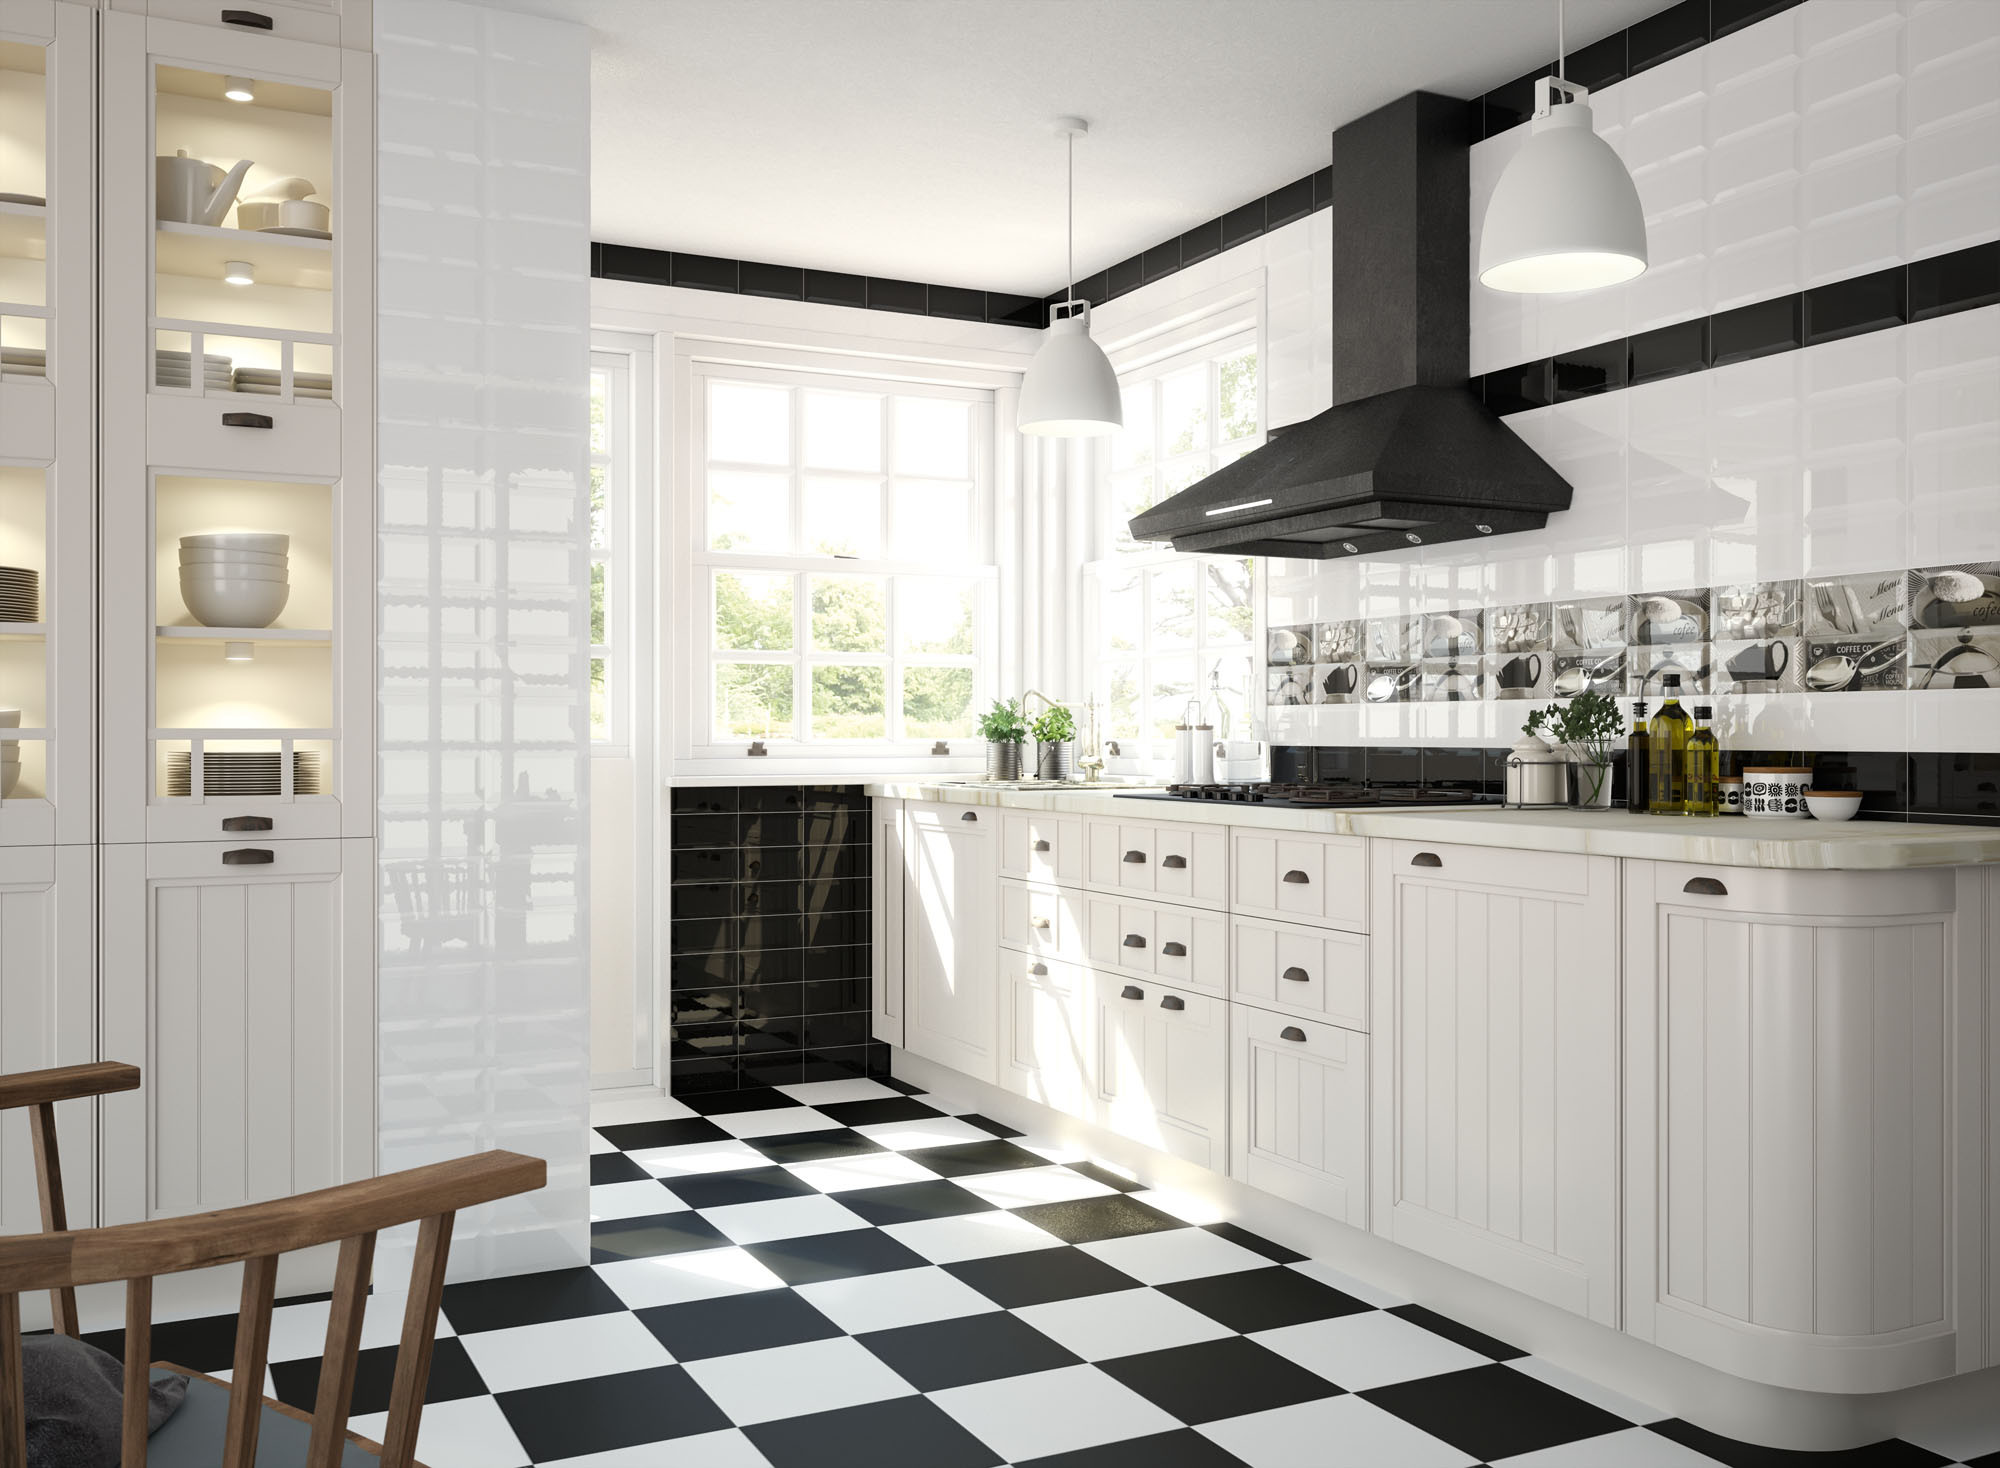 facettenfliesen fliesen und platten glossar baunetz. Black Bedroom Furniture Sets. Home Design Ideas